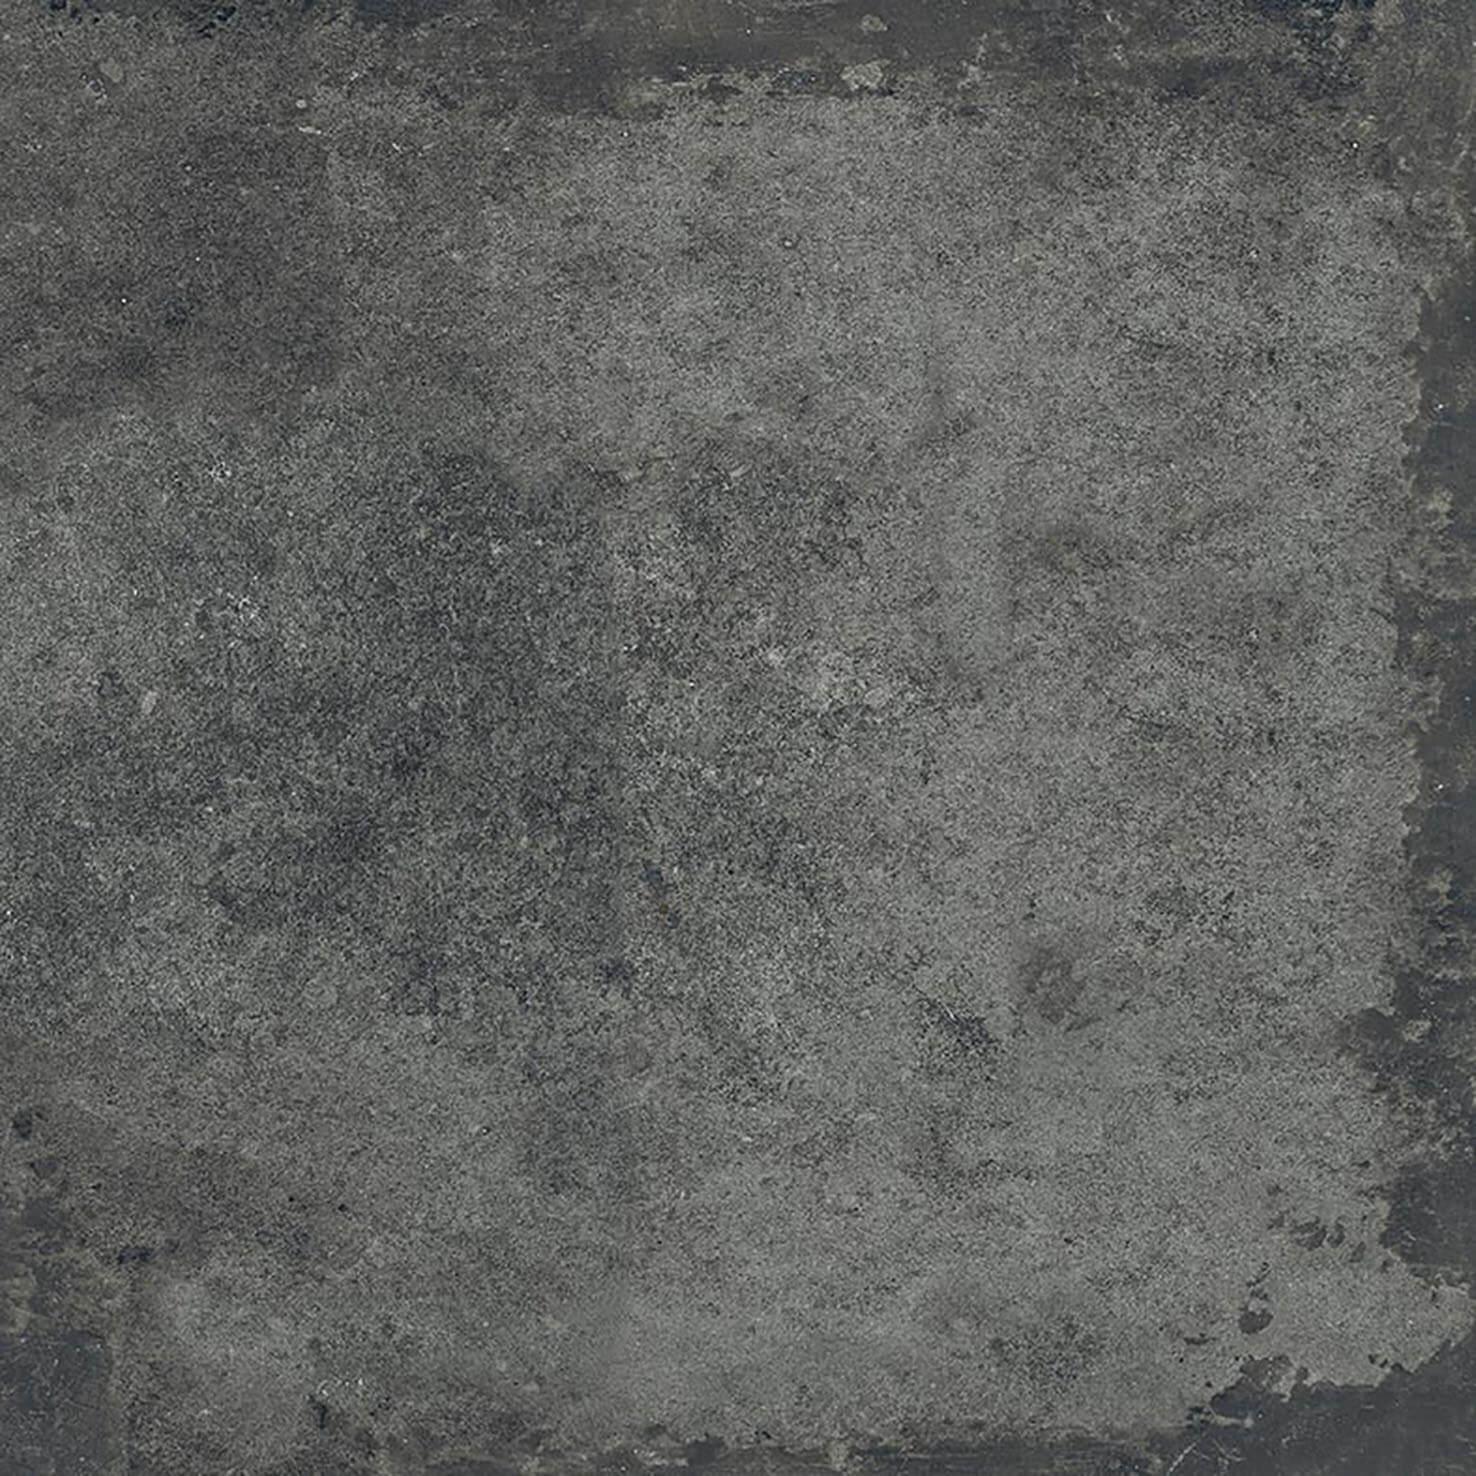 00130_CASTLESTONE_BLACK_NAT-RET_60X60